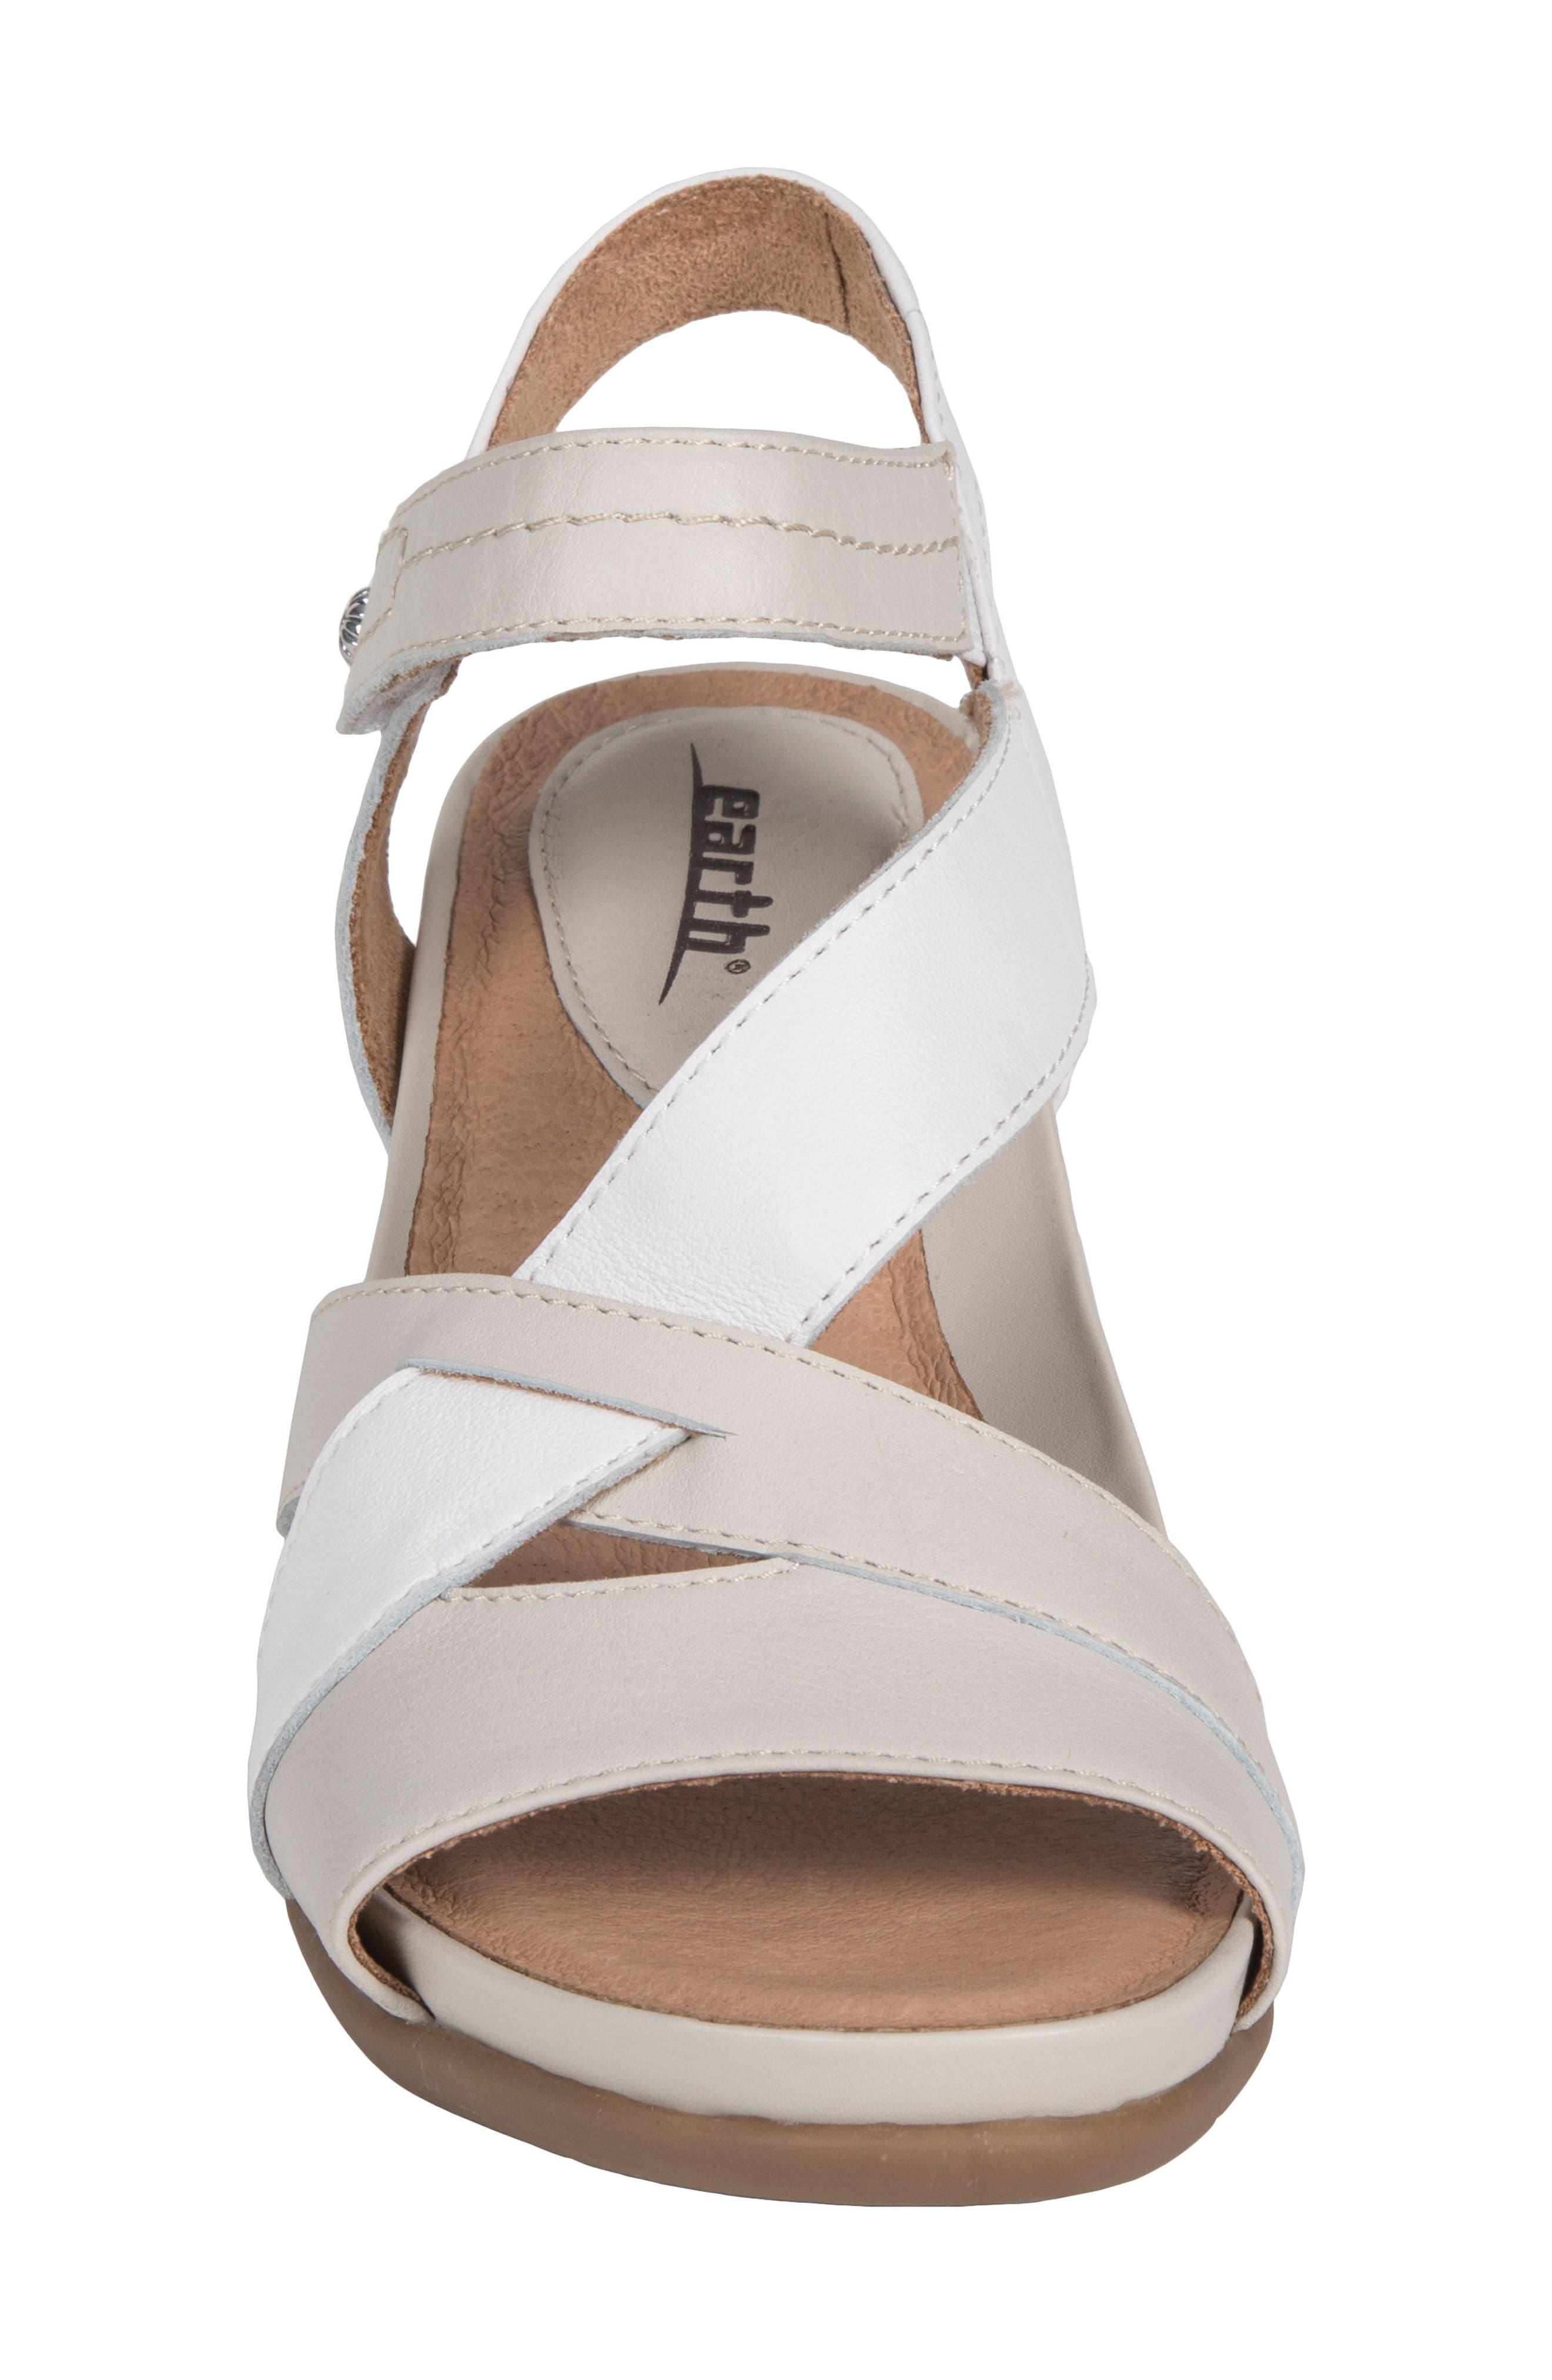 Thistle Wedge Sandal,                             Alternate thumbnail 14, color,